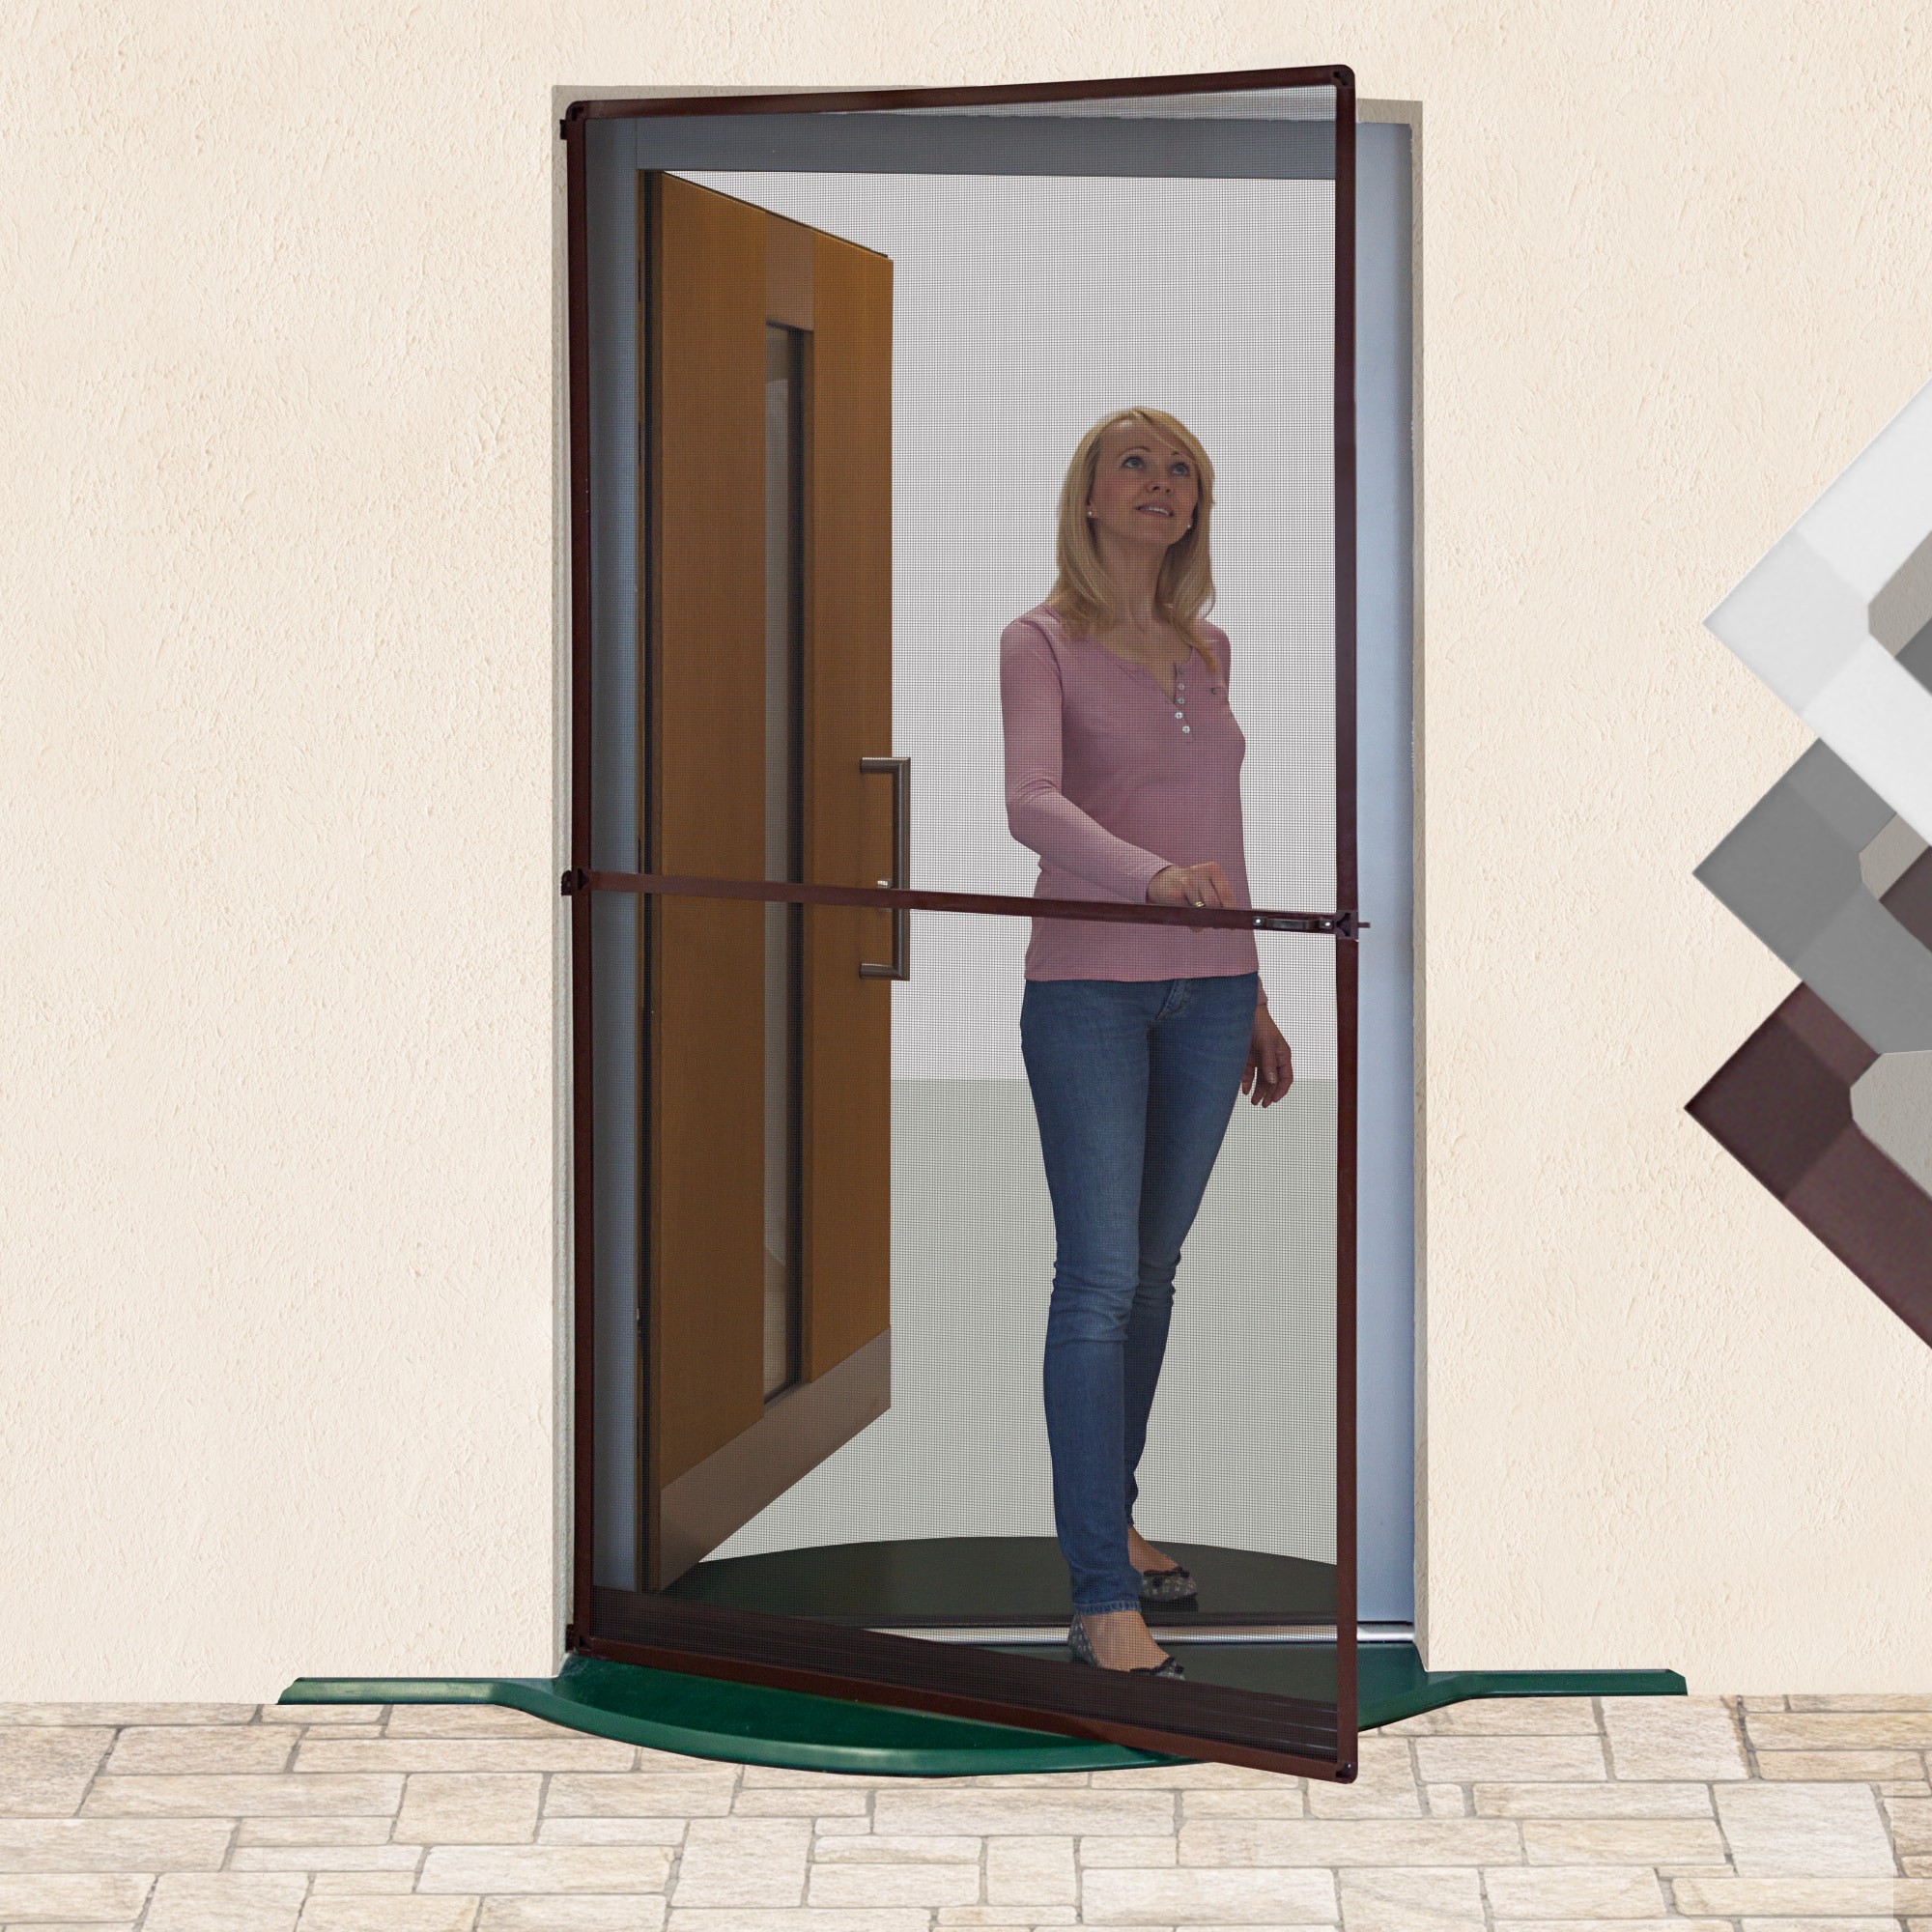 jarolift insektenschutzvorhang magnetvorhang magnet verschluss fliegengitter ebay. Black Bedroom Furniture Sets. Home Design Ideas